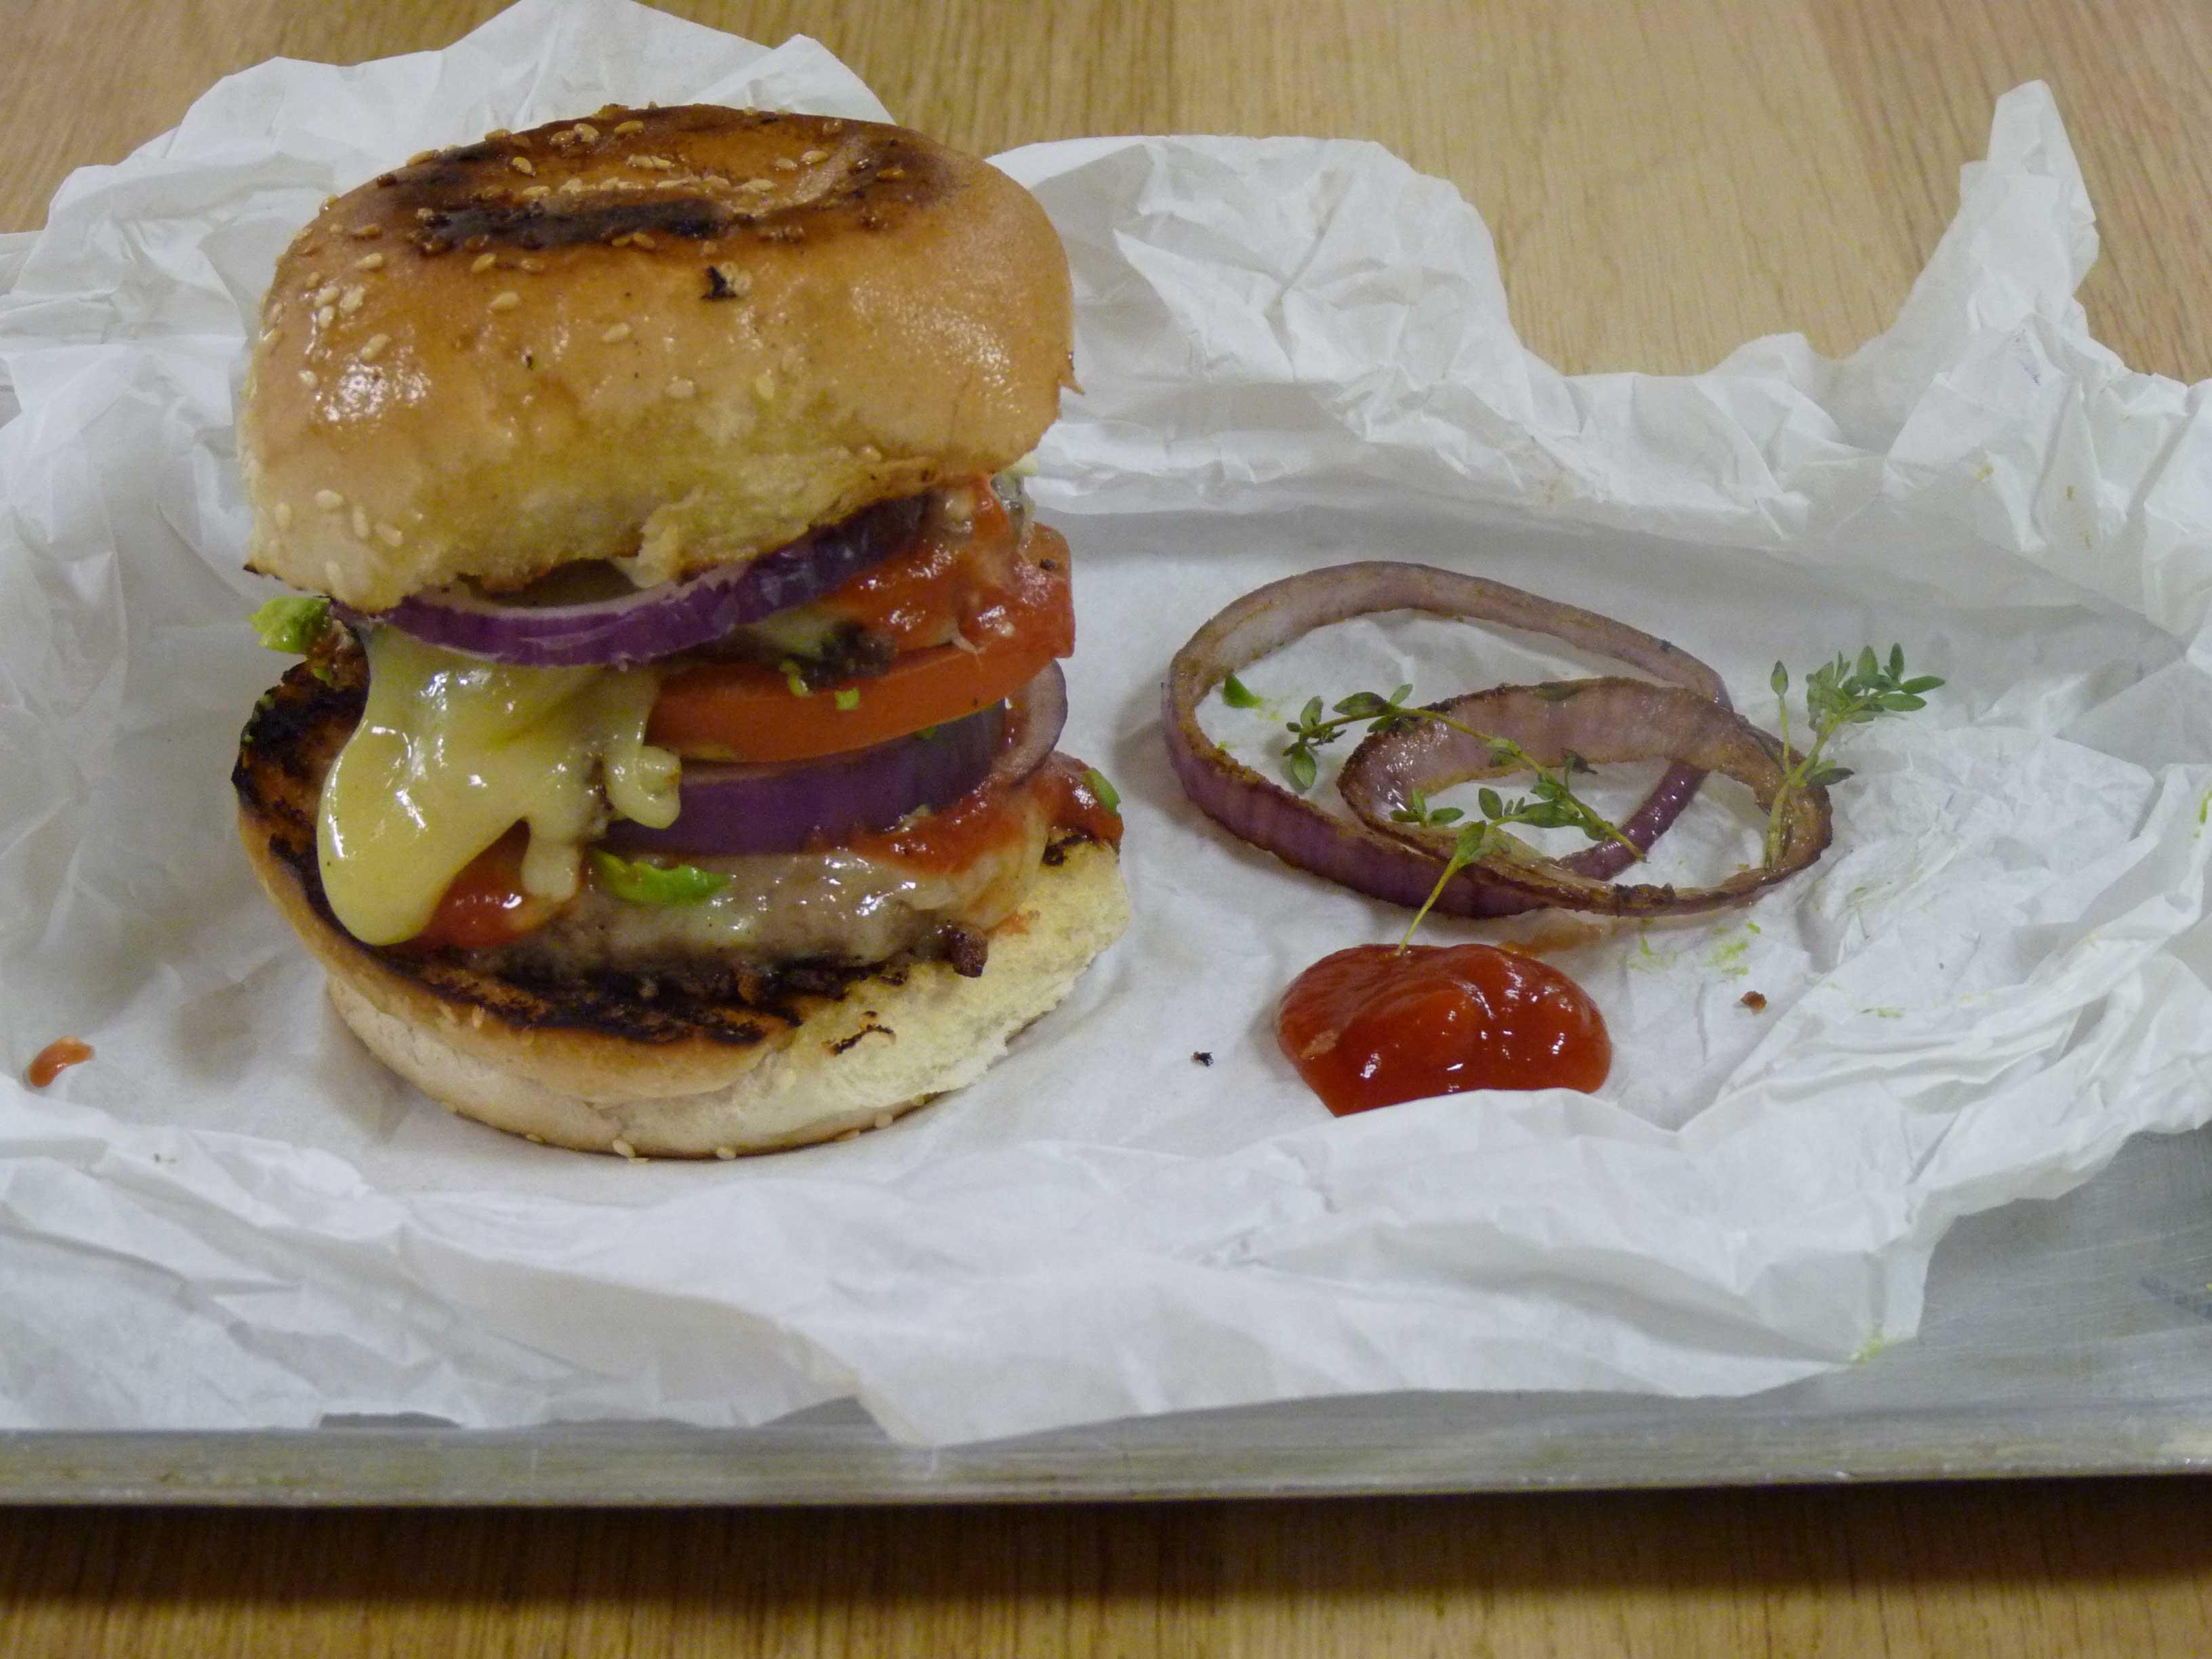 Leiths---burger